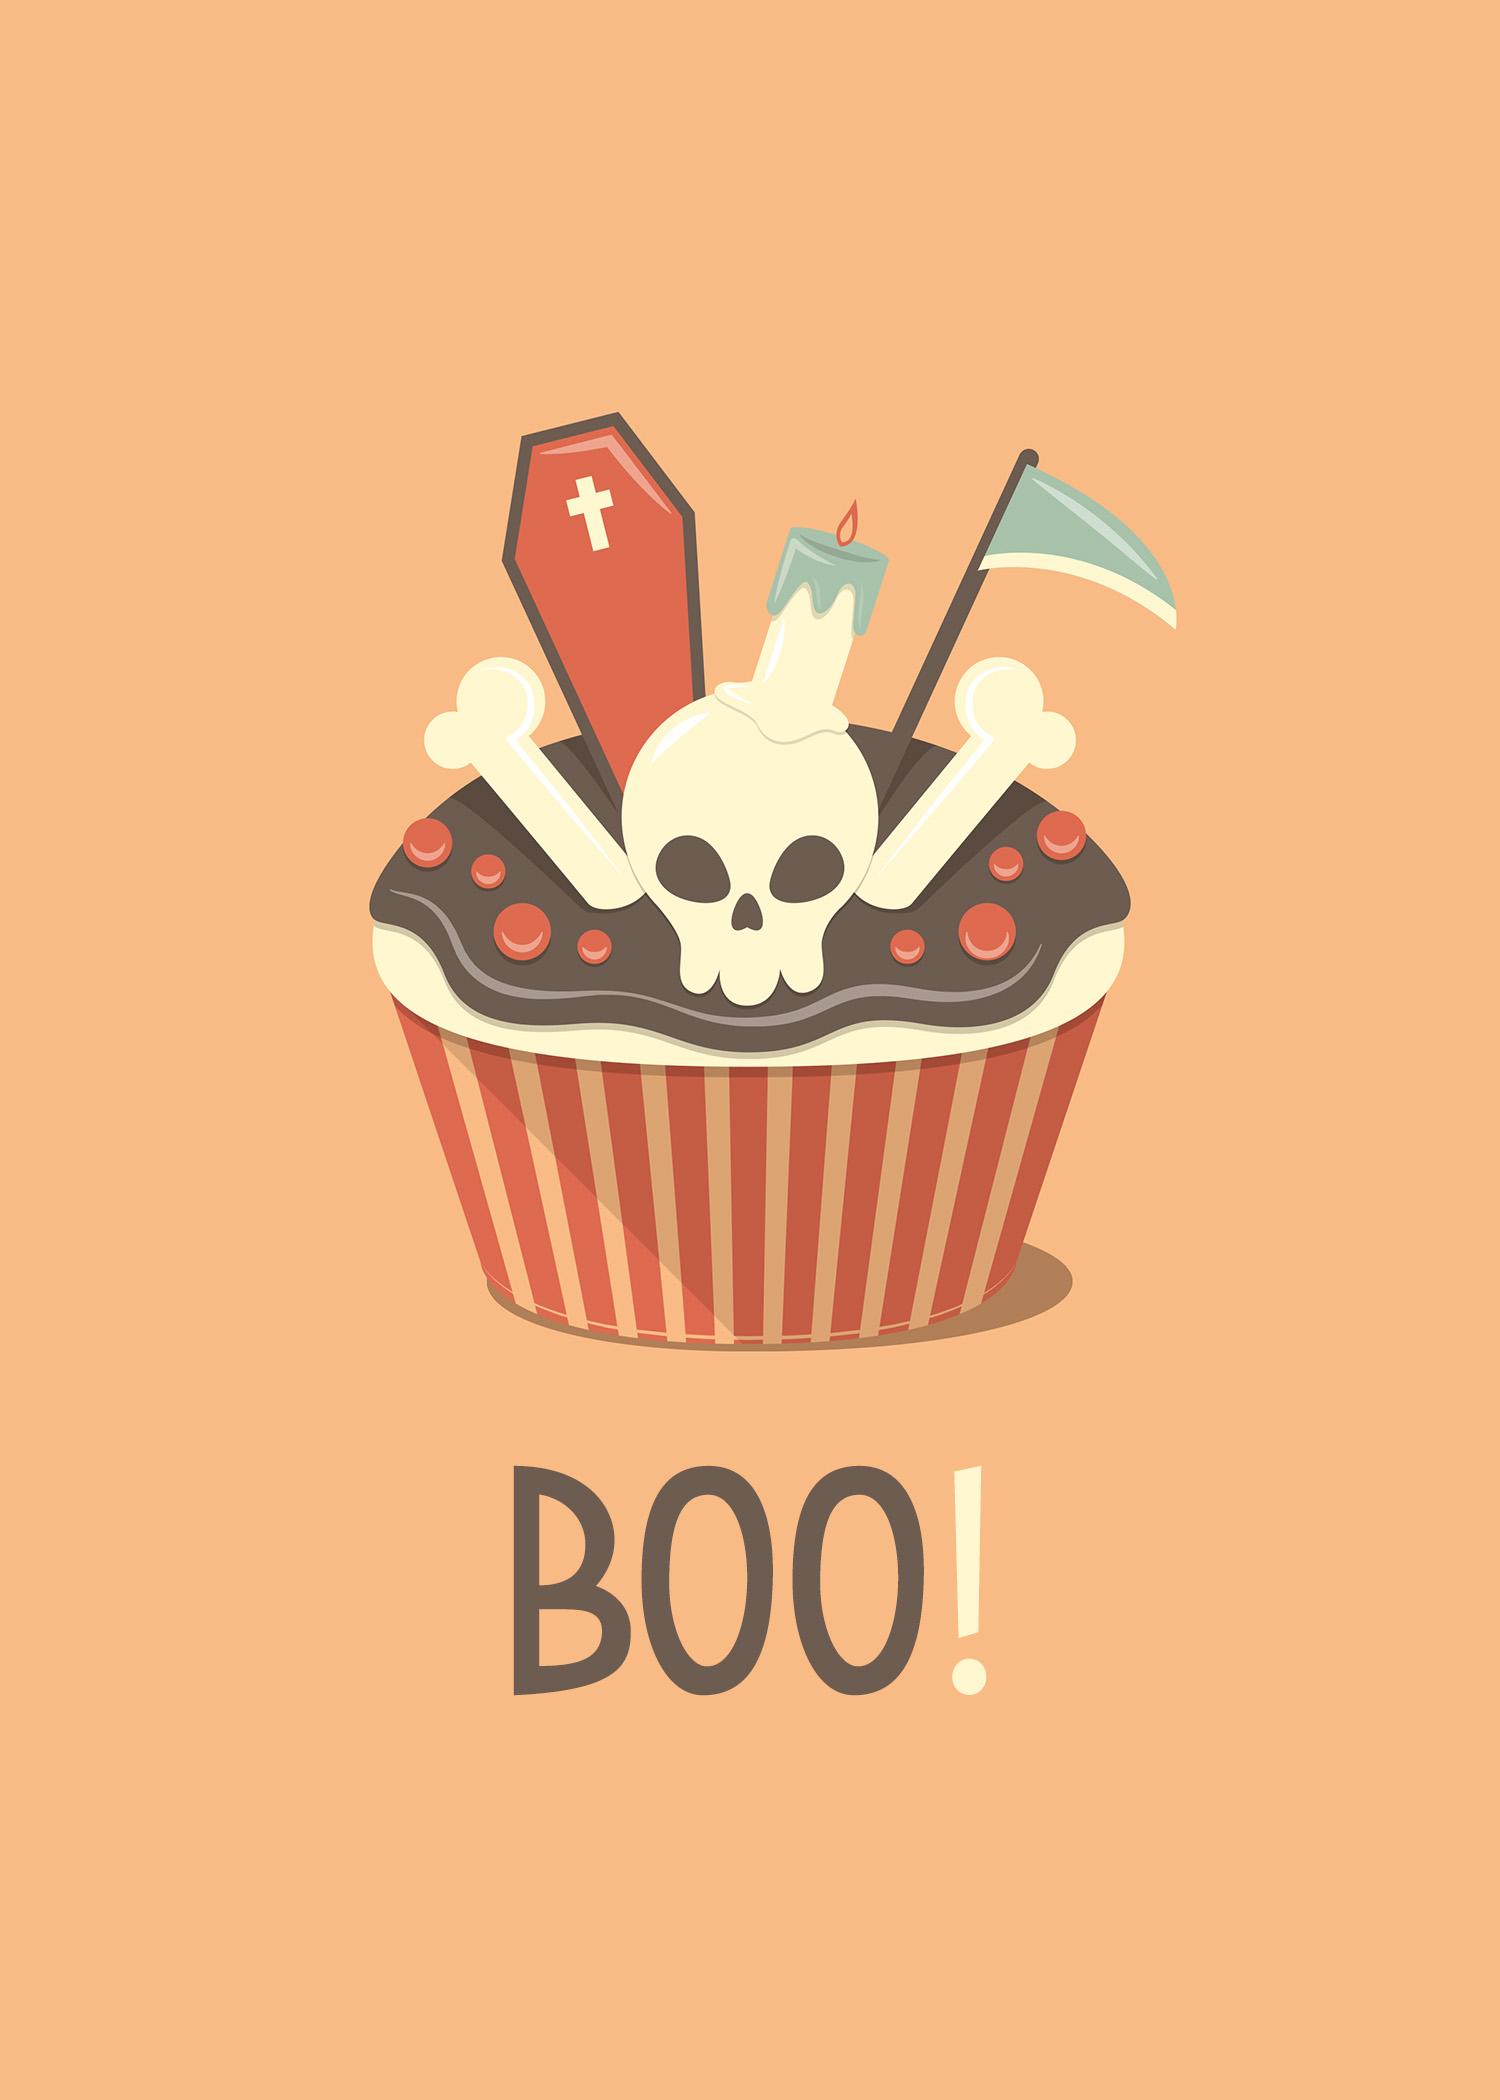 Free Printable Halloween Cupcake Prints The Cottage Market